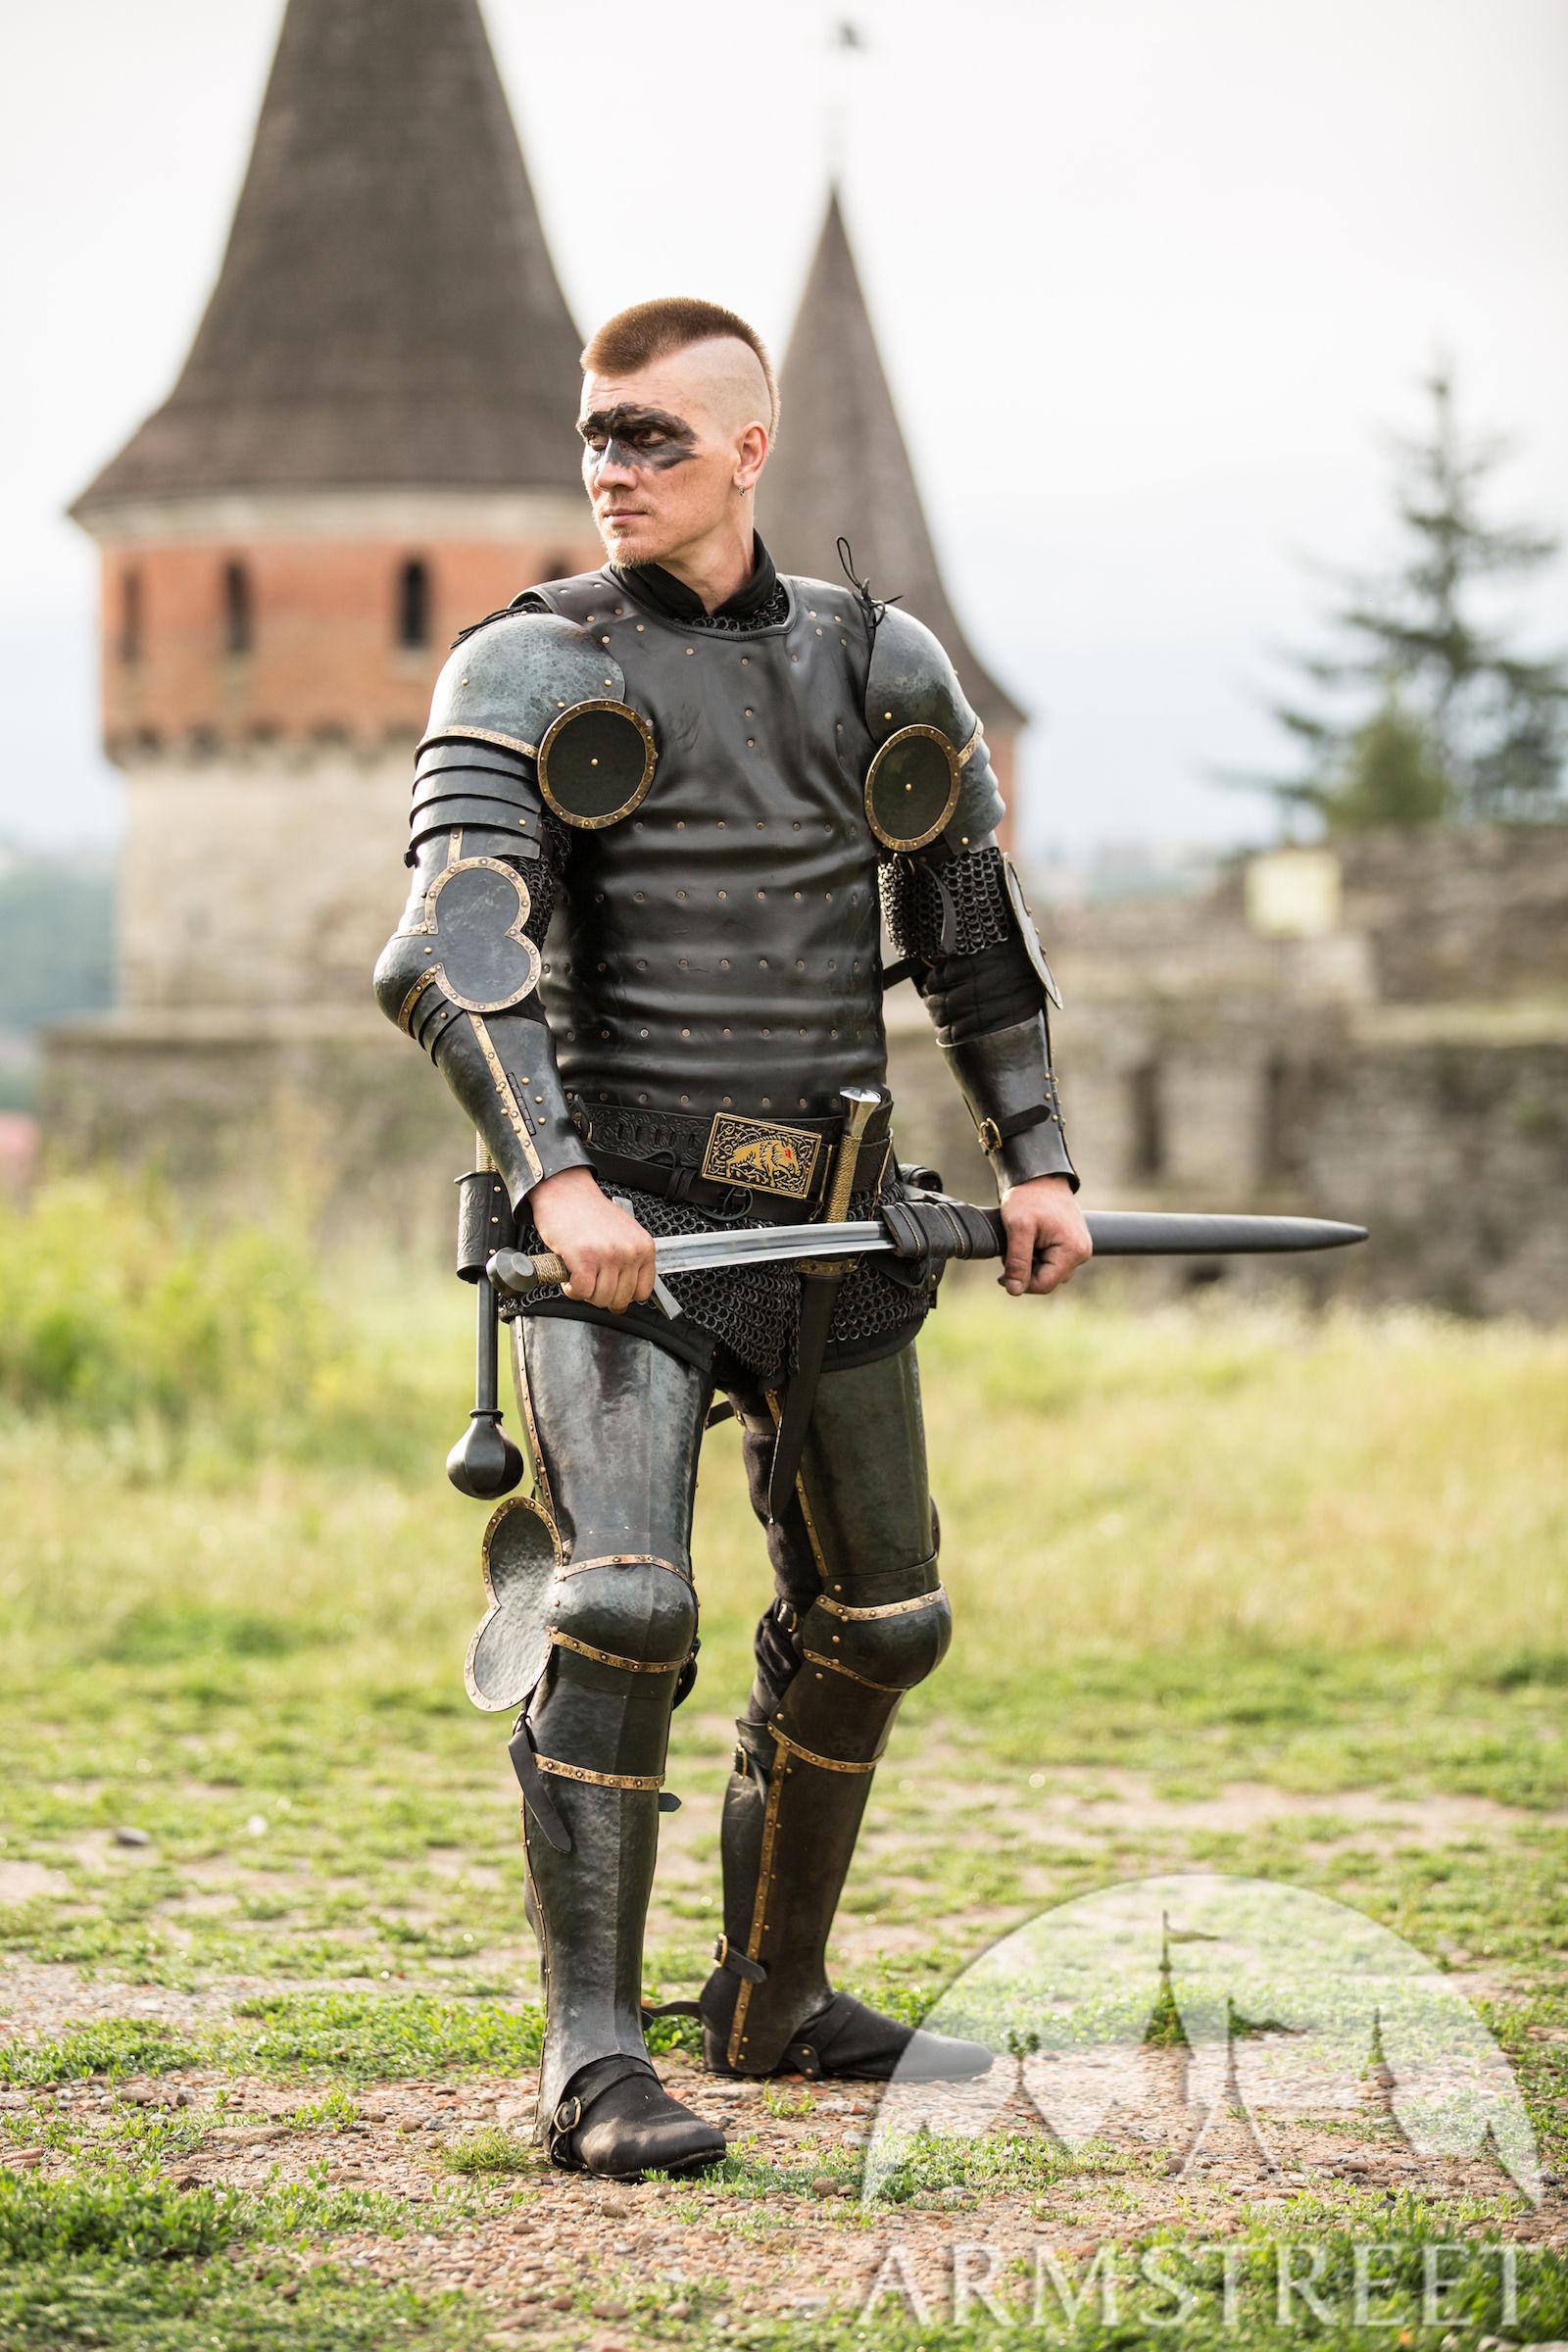 "Black Armor Kit ""The Wayward Knight"" For Sale. Available"